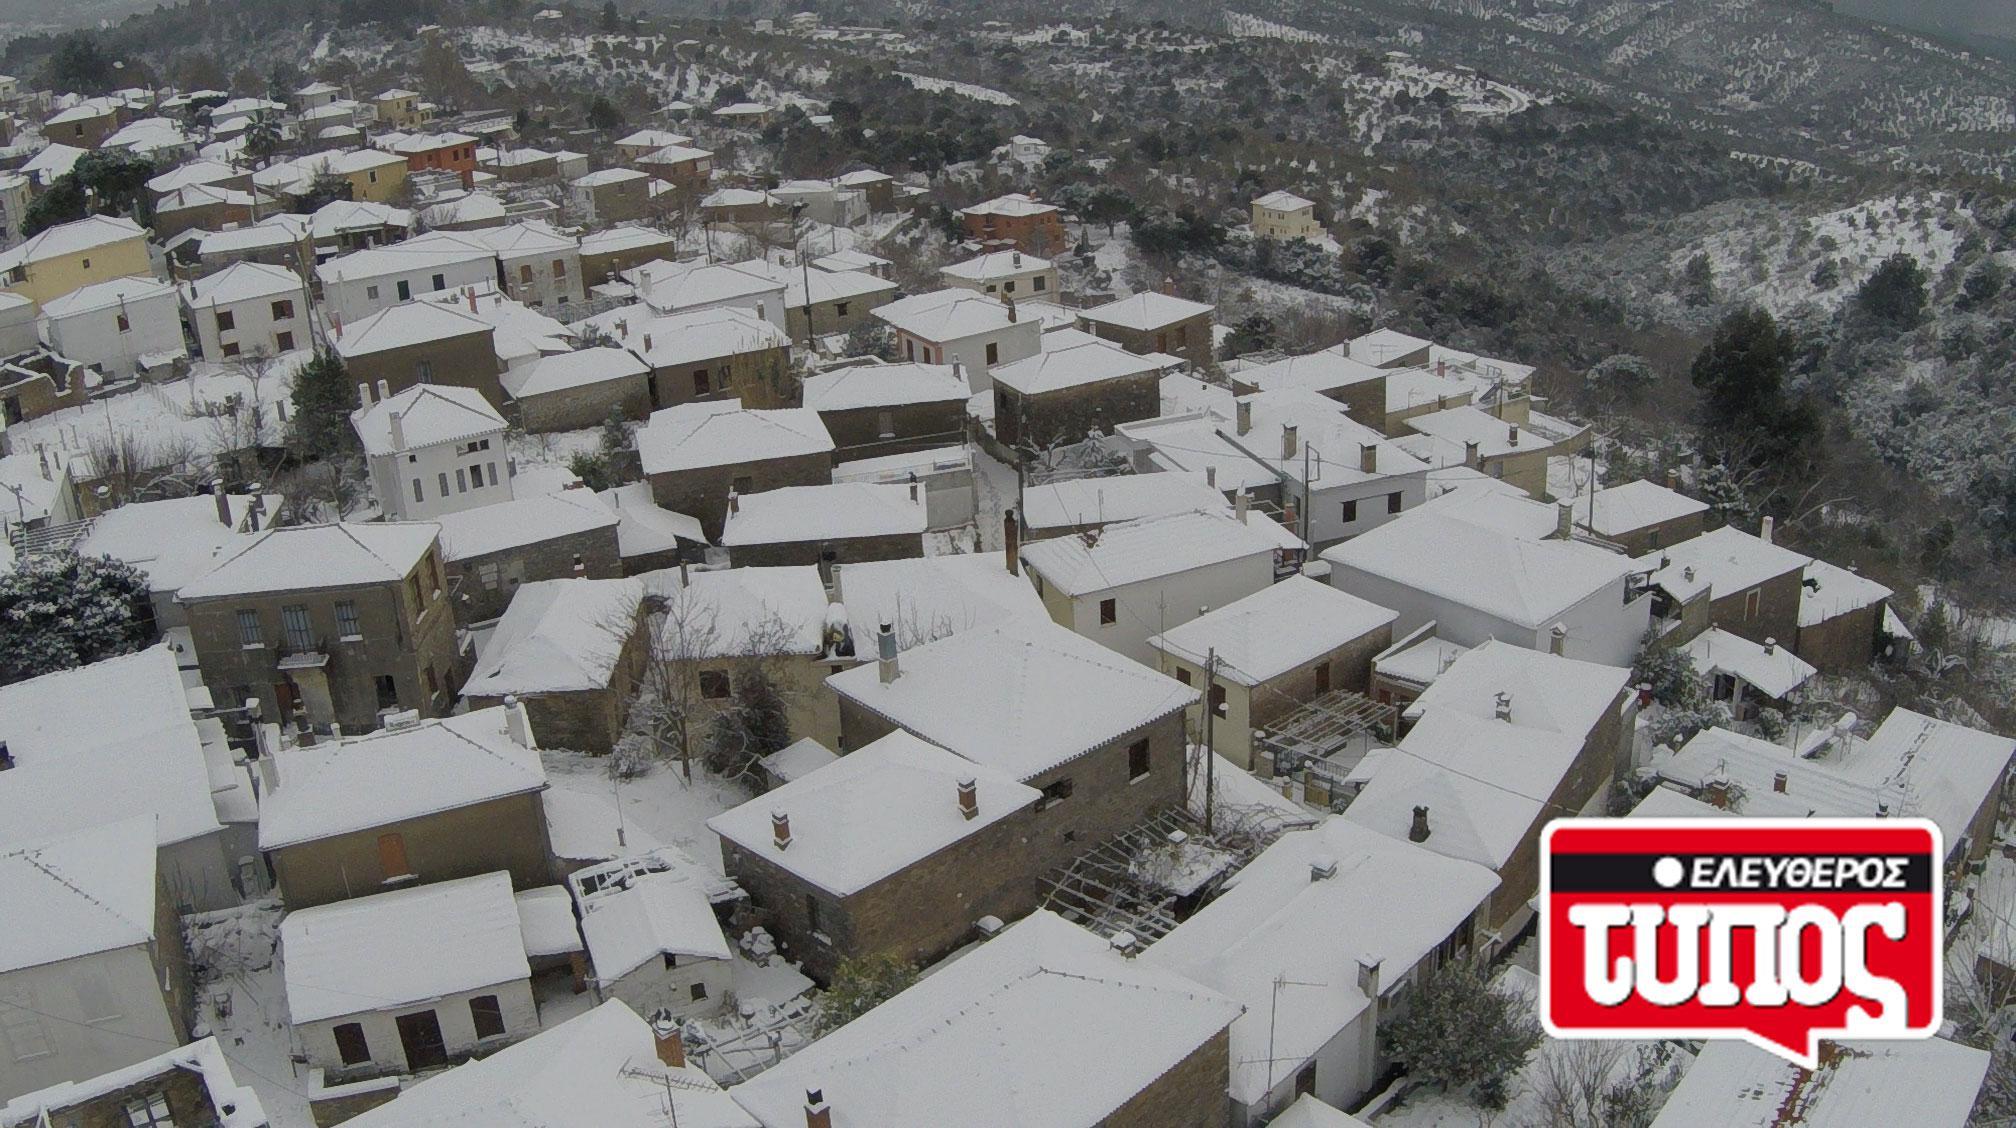 laukos-piliou-xionismenos-aerofotografies-1300-3 Εντυπωσιακές αεροφωτογραφίες από το χιονισμένο Λαύκο Πηλίου [εικόνες]